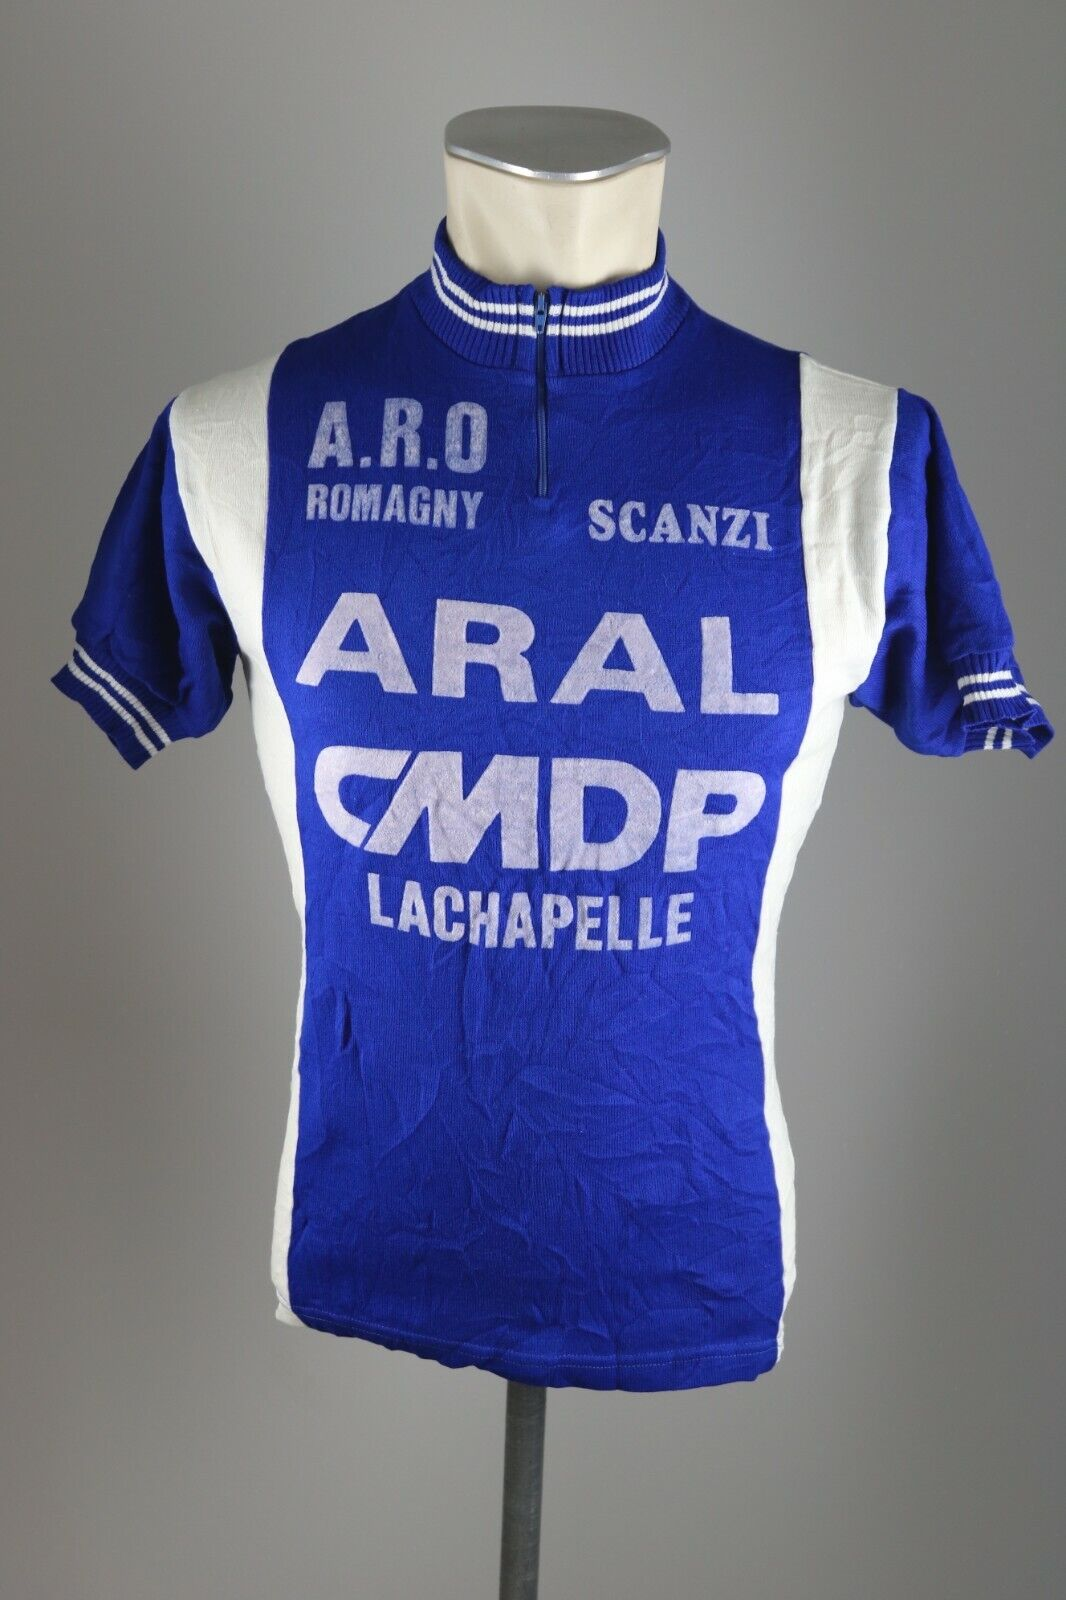 ARAL CMDP Lachapelle Crylor acrylique cycling Rad Trikot Gr. S-M bike jersey ES1